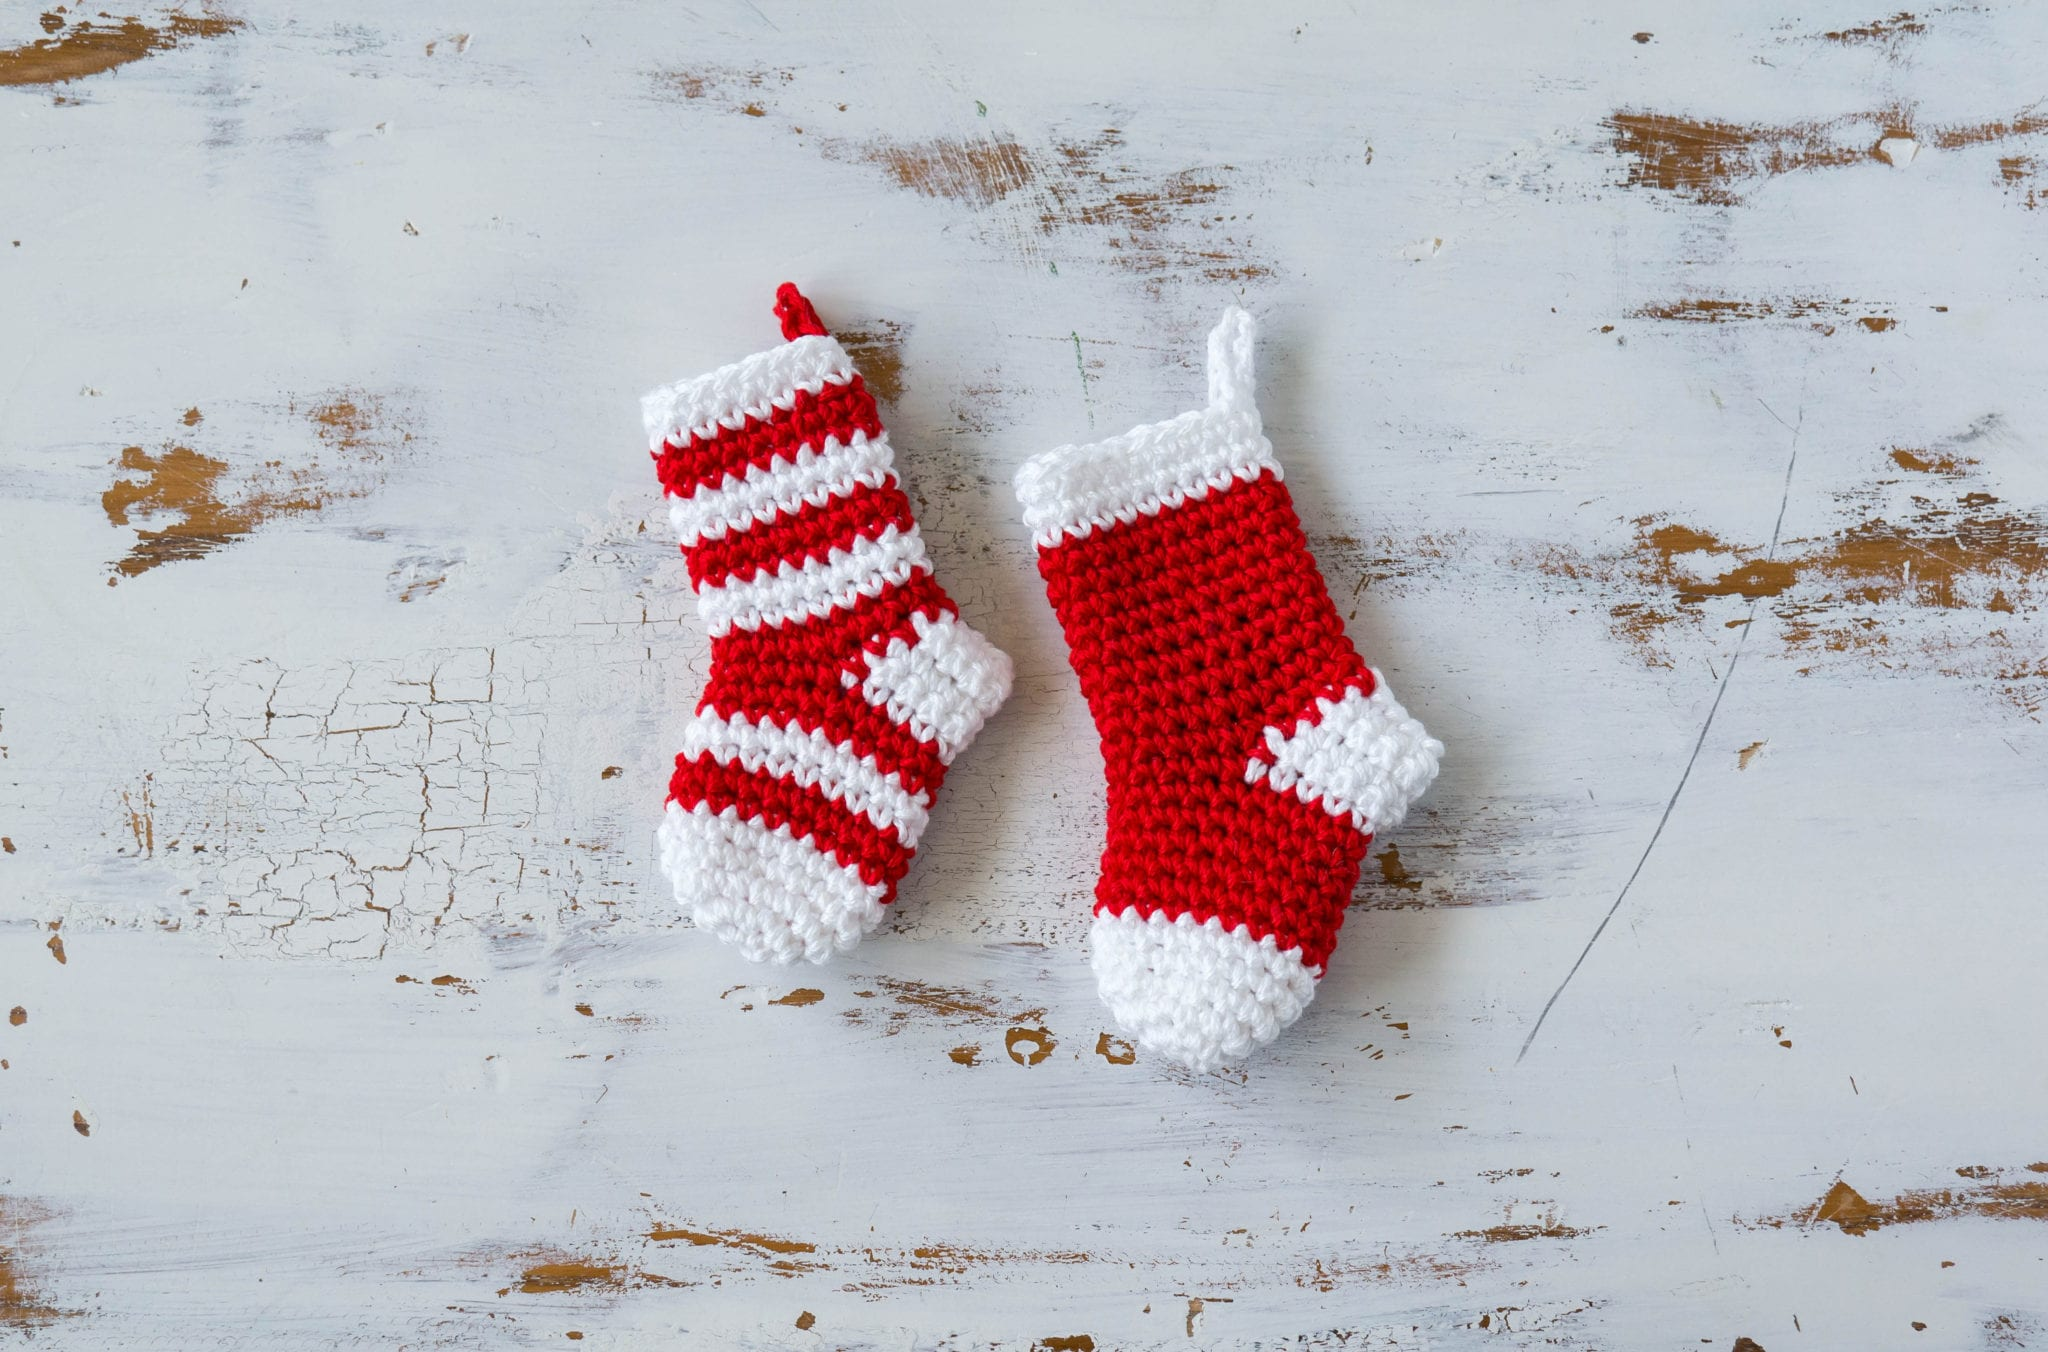 Crochet Christmas Stocking.Crochet Mini Stockings Christmas Ornament Sewrella